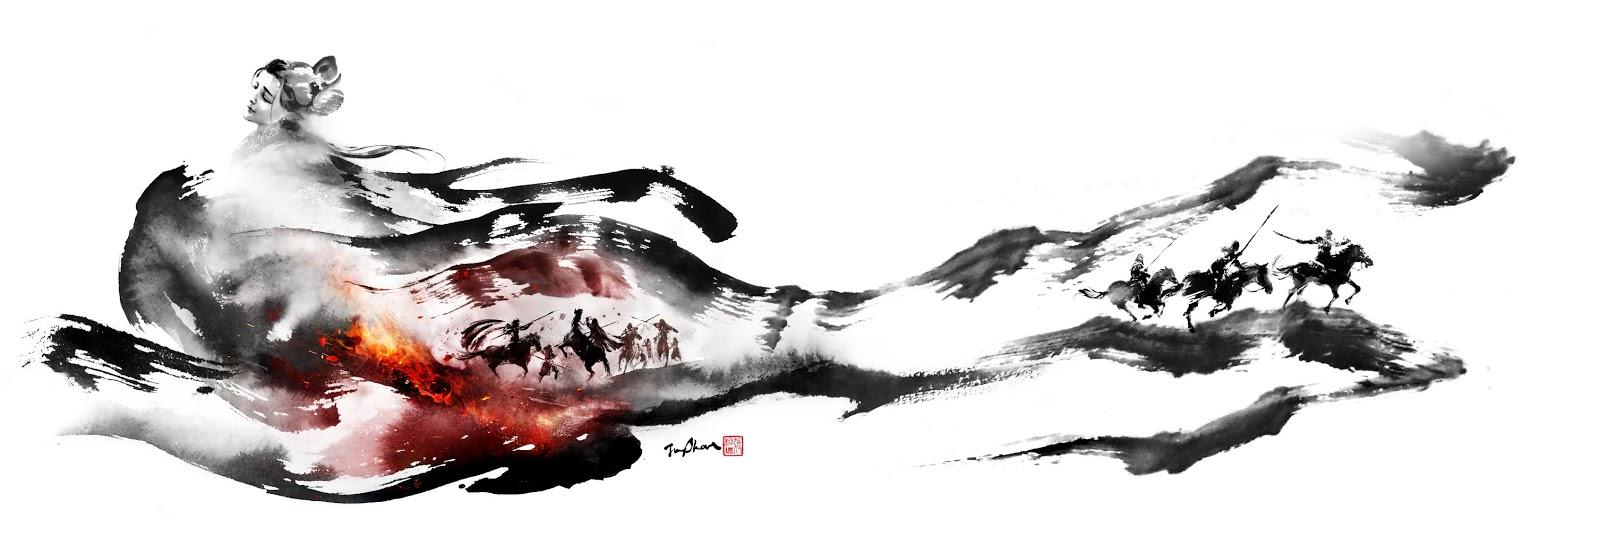 Sun Tzu - Diriger et Gouverner